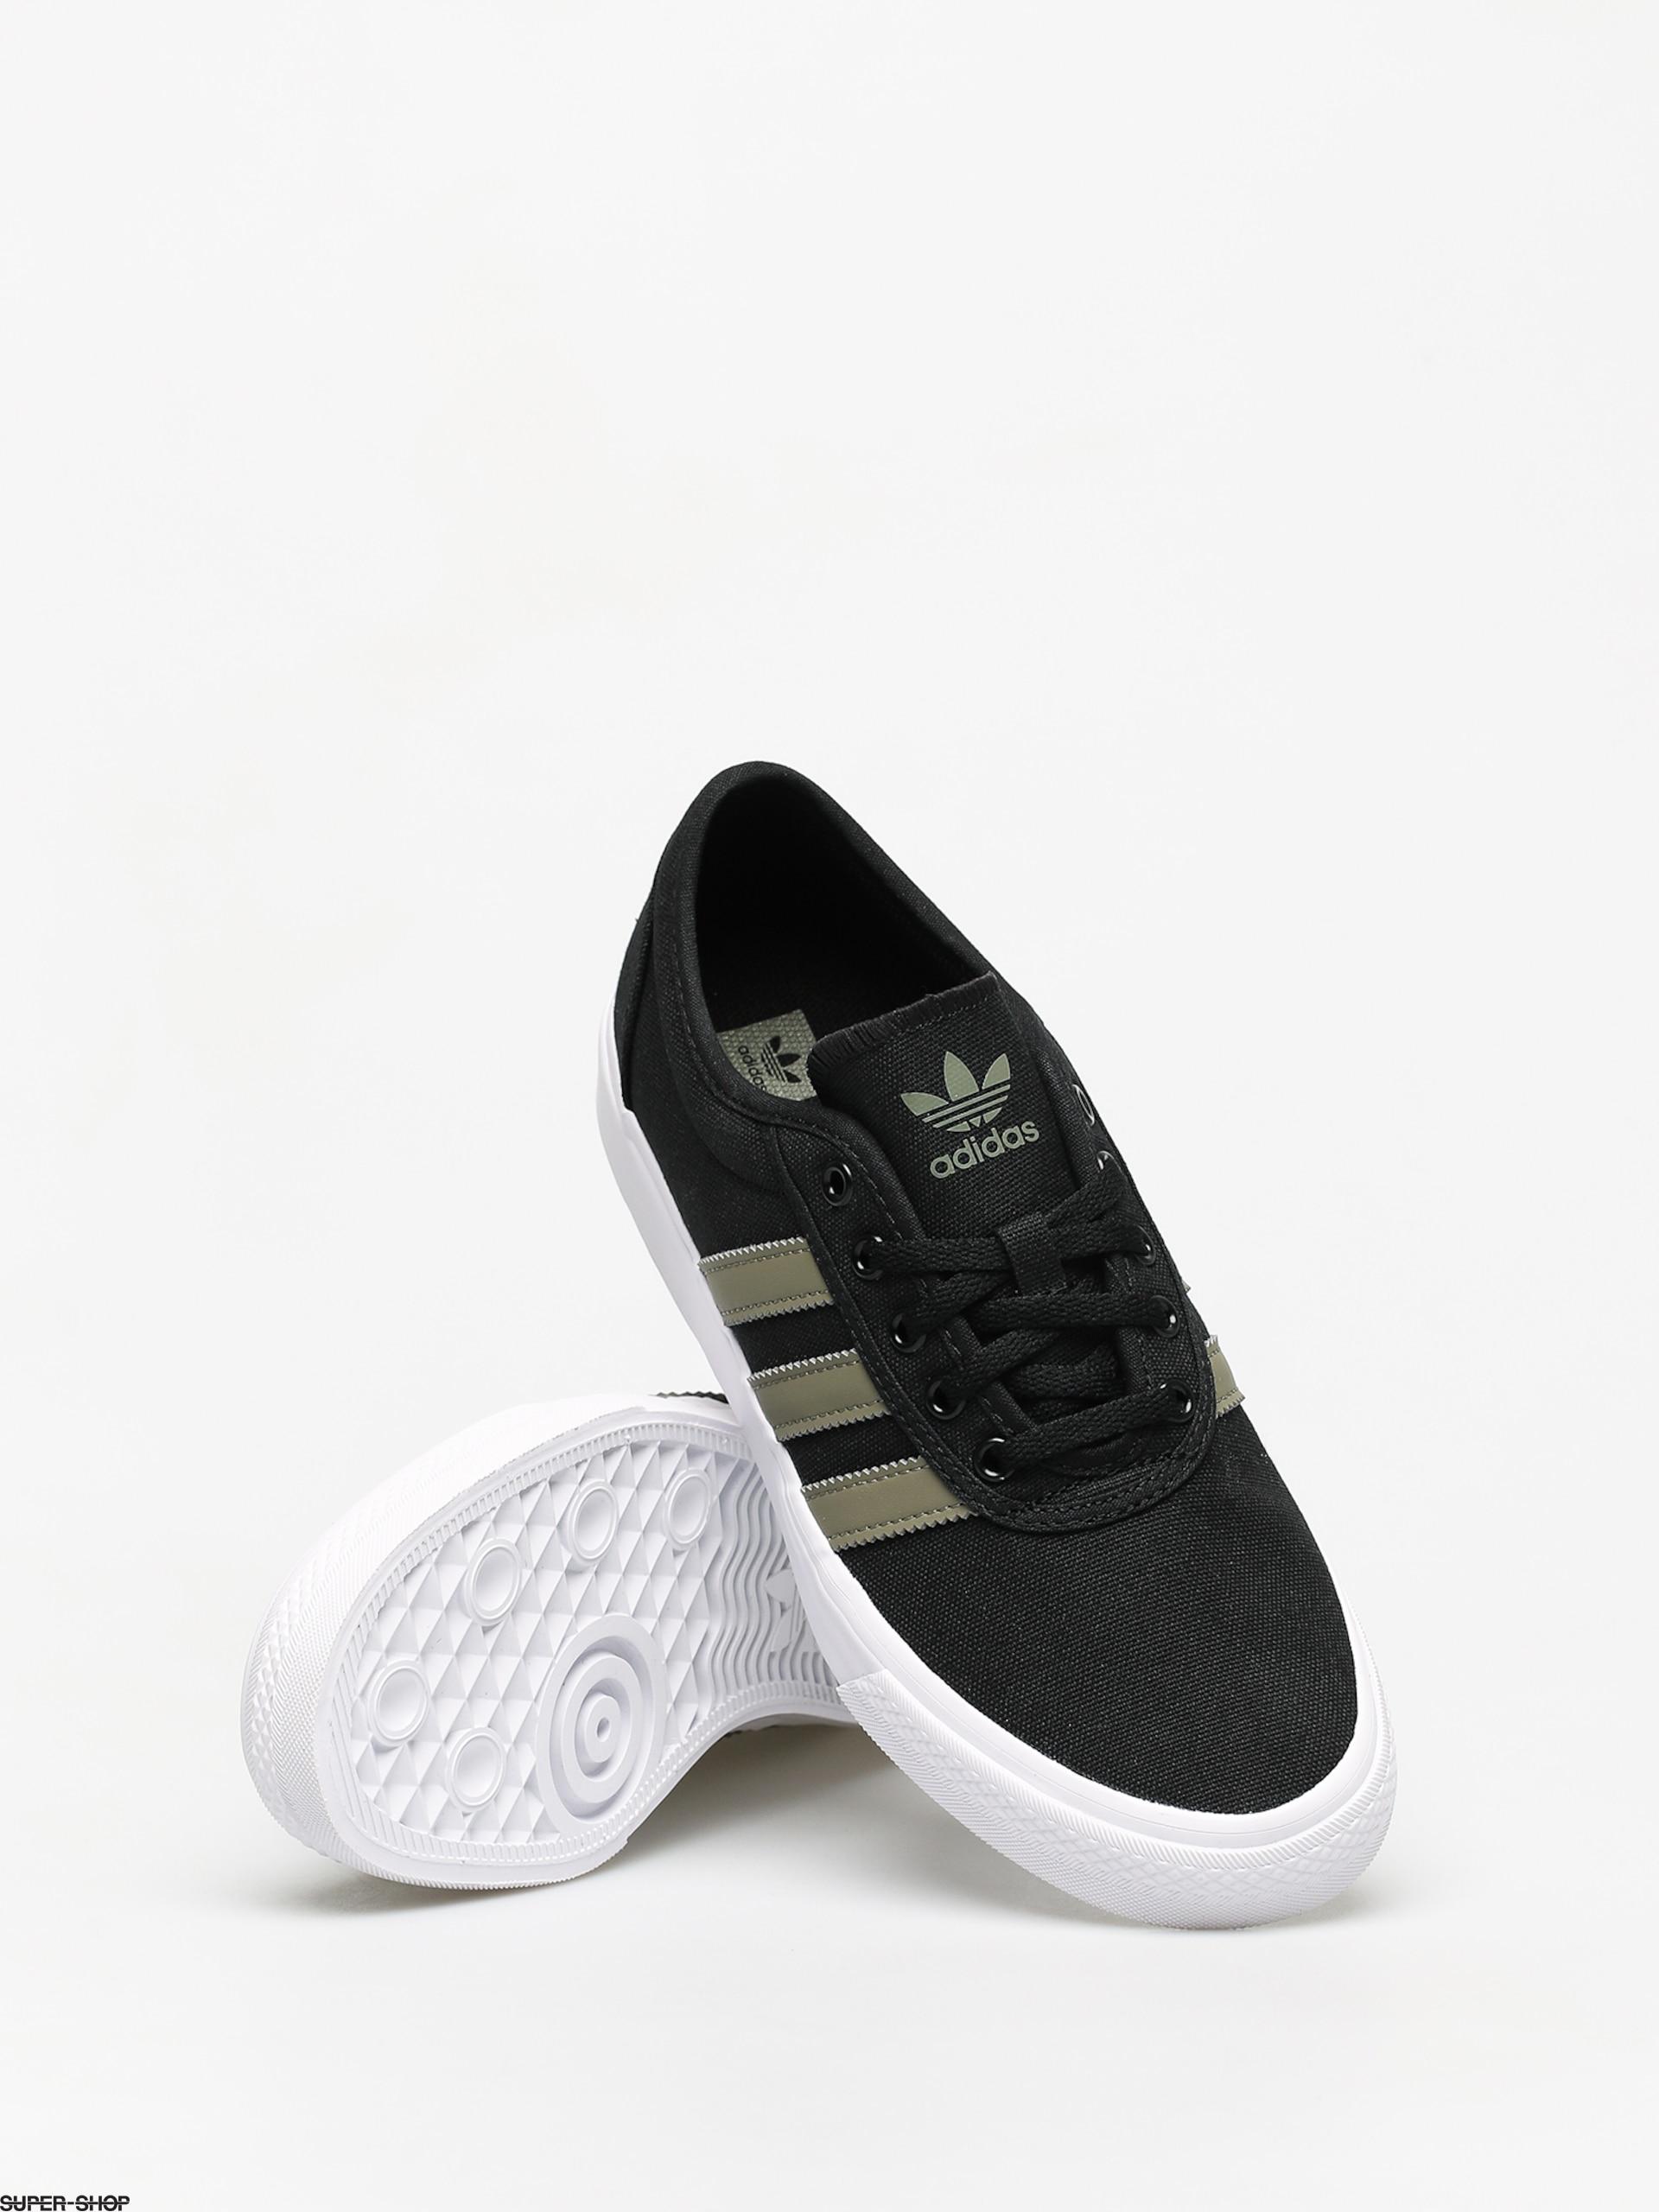 adidas originals Adi Ease NoiessFtwbla